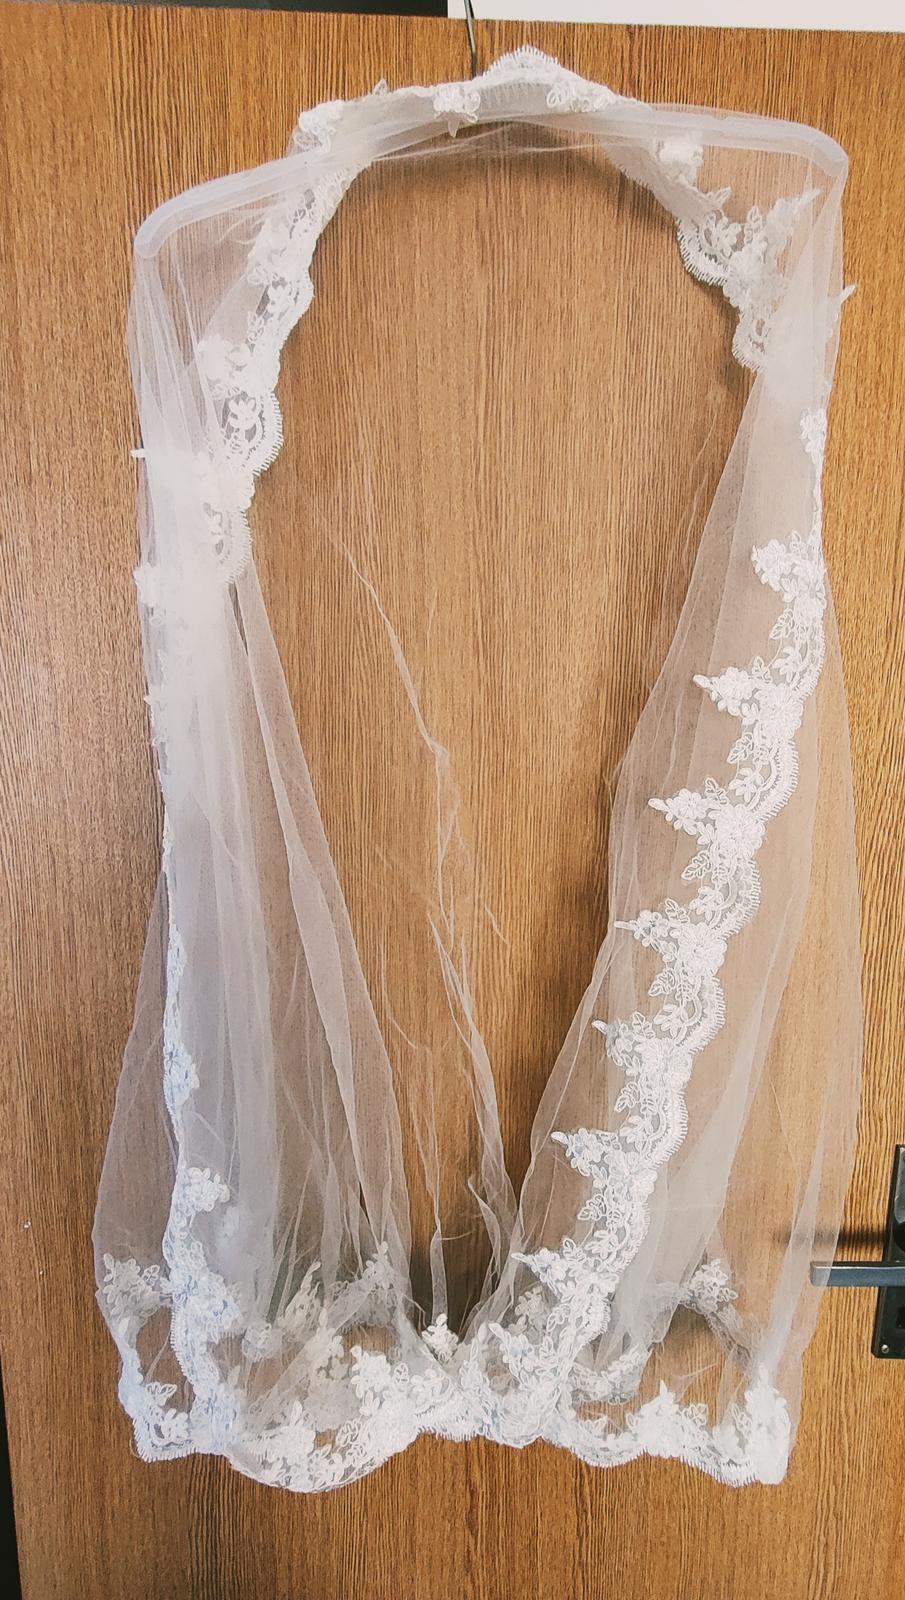 Jednoduché svadobné šaty - Obrázok č. 3